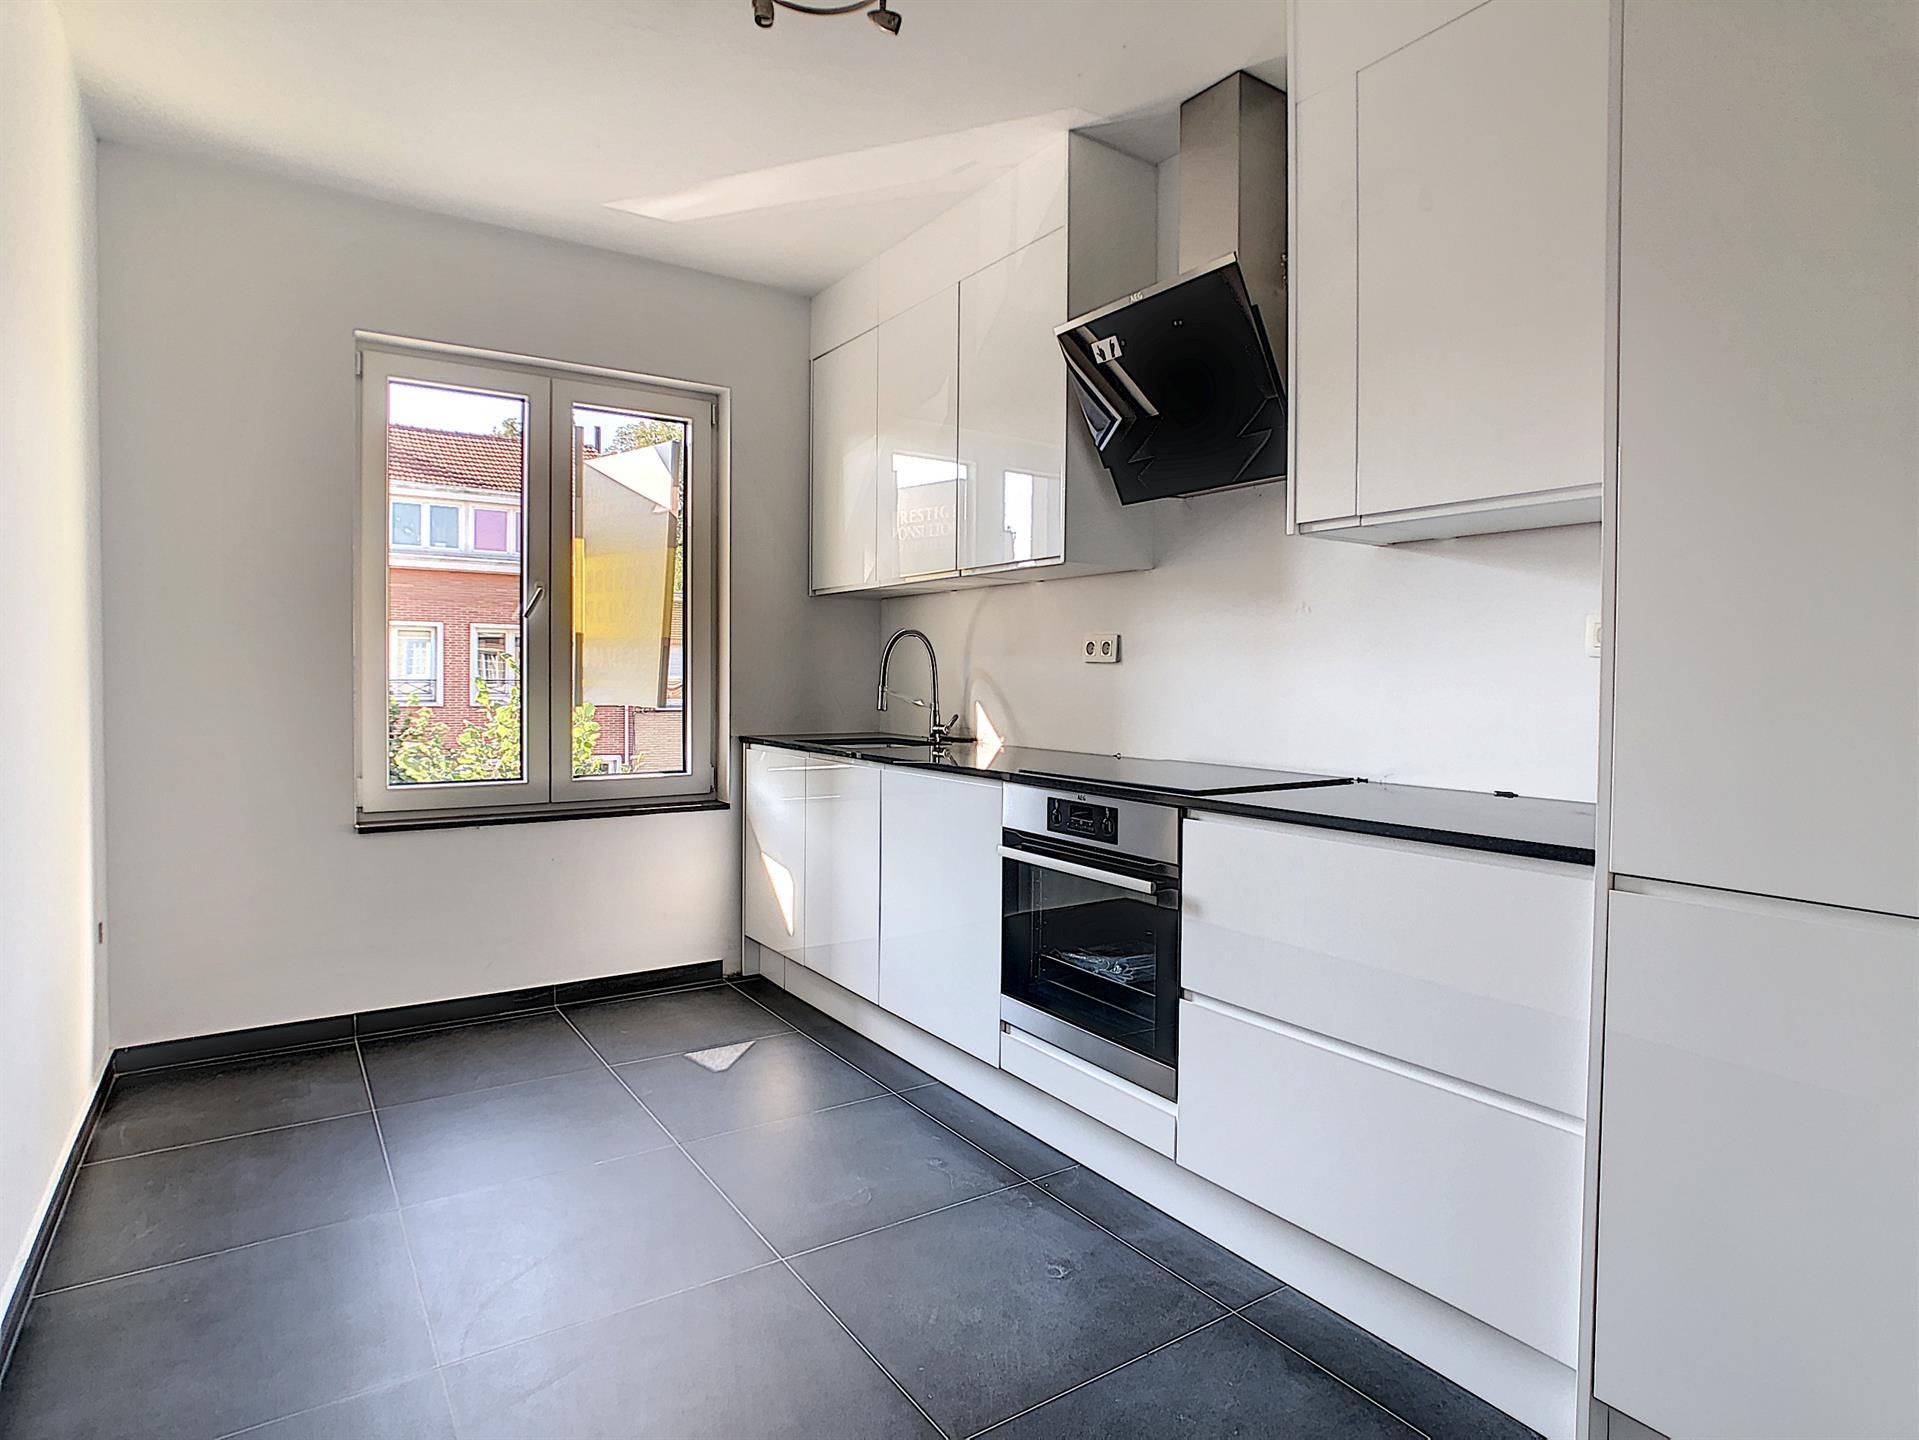 Appartement - Anderlecht - #4252388-27